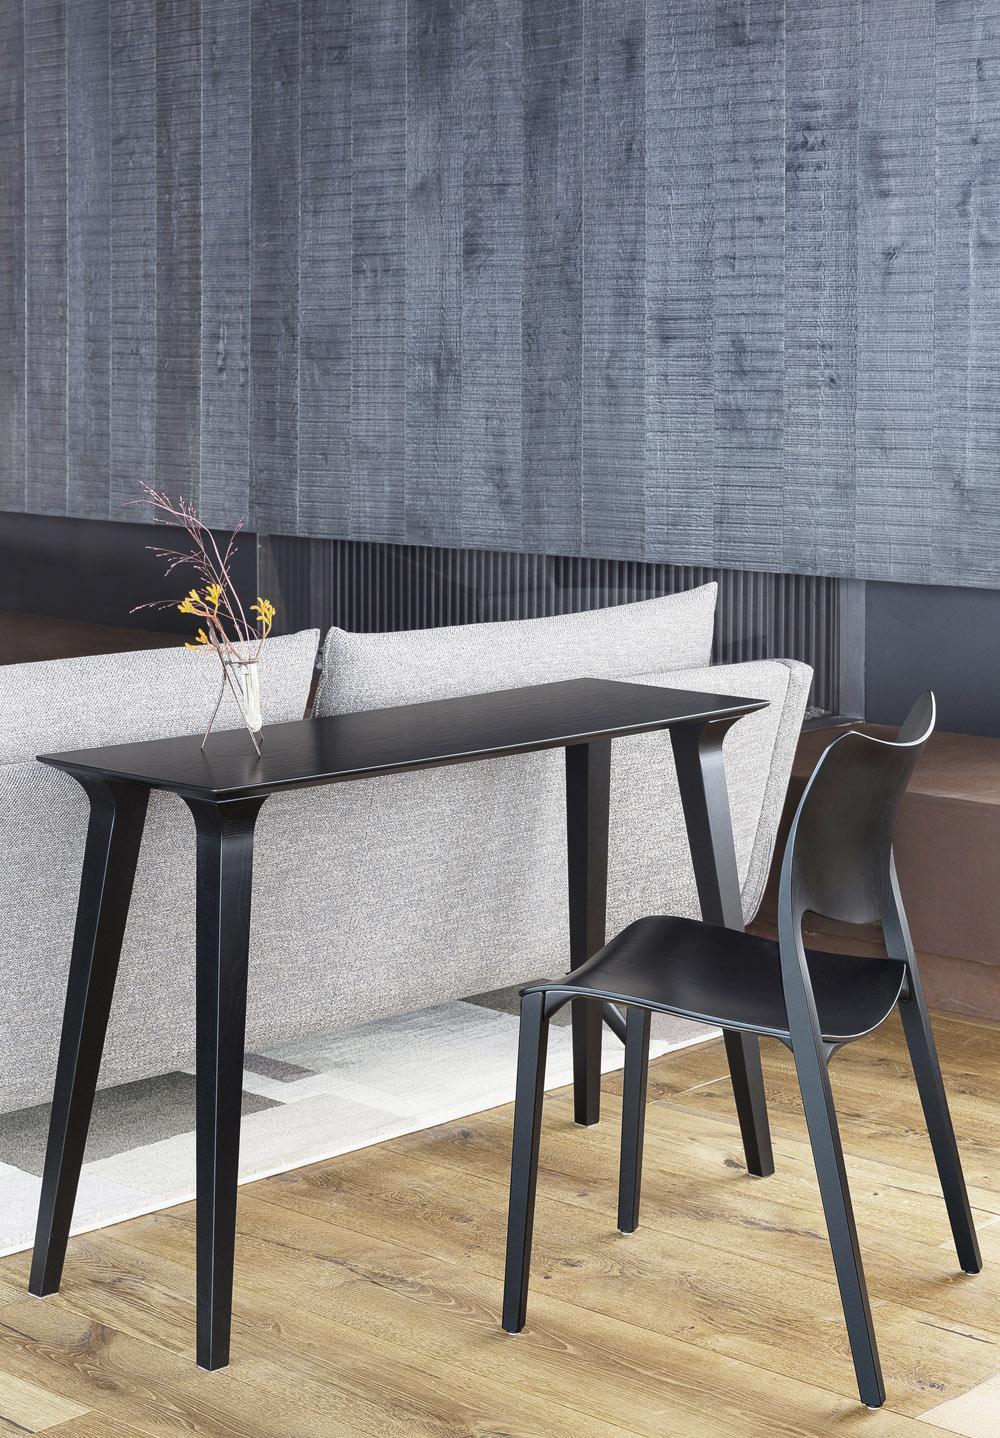 chair design restaurant rattan lounge stua wood table console lau